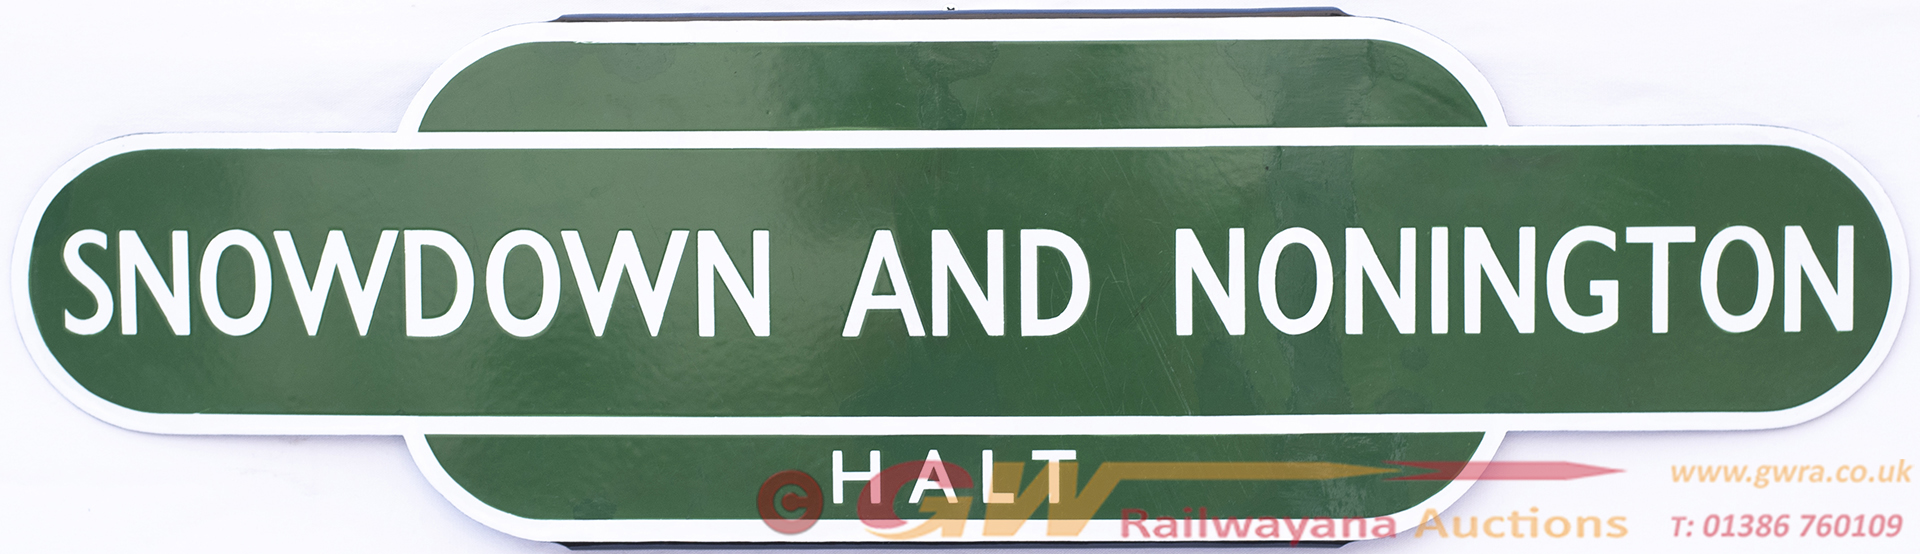 Totem BR(S) HF SNOWDOWN AND NONNINGTON HALT From